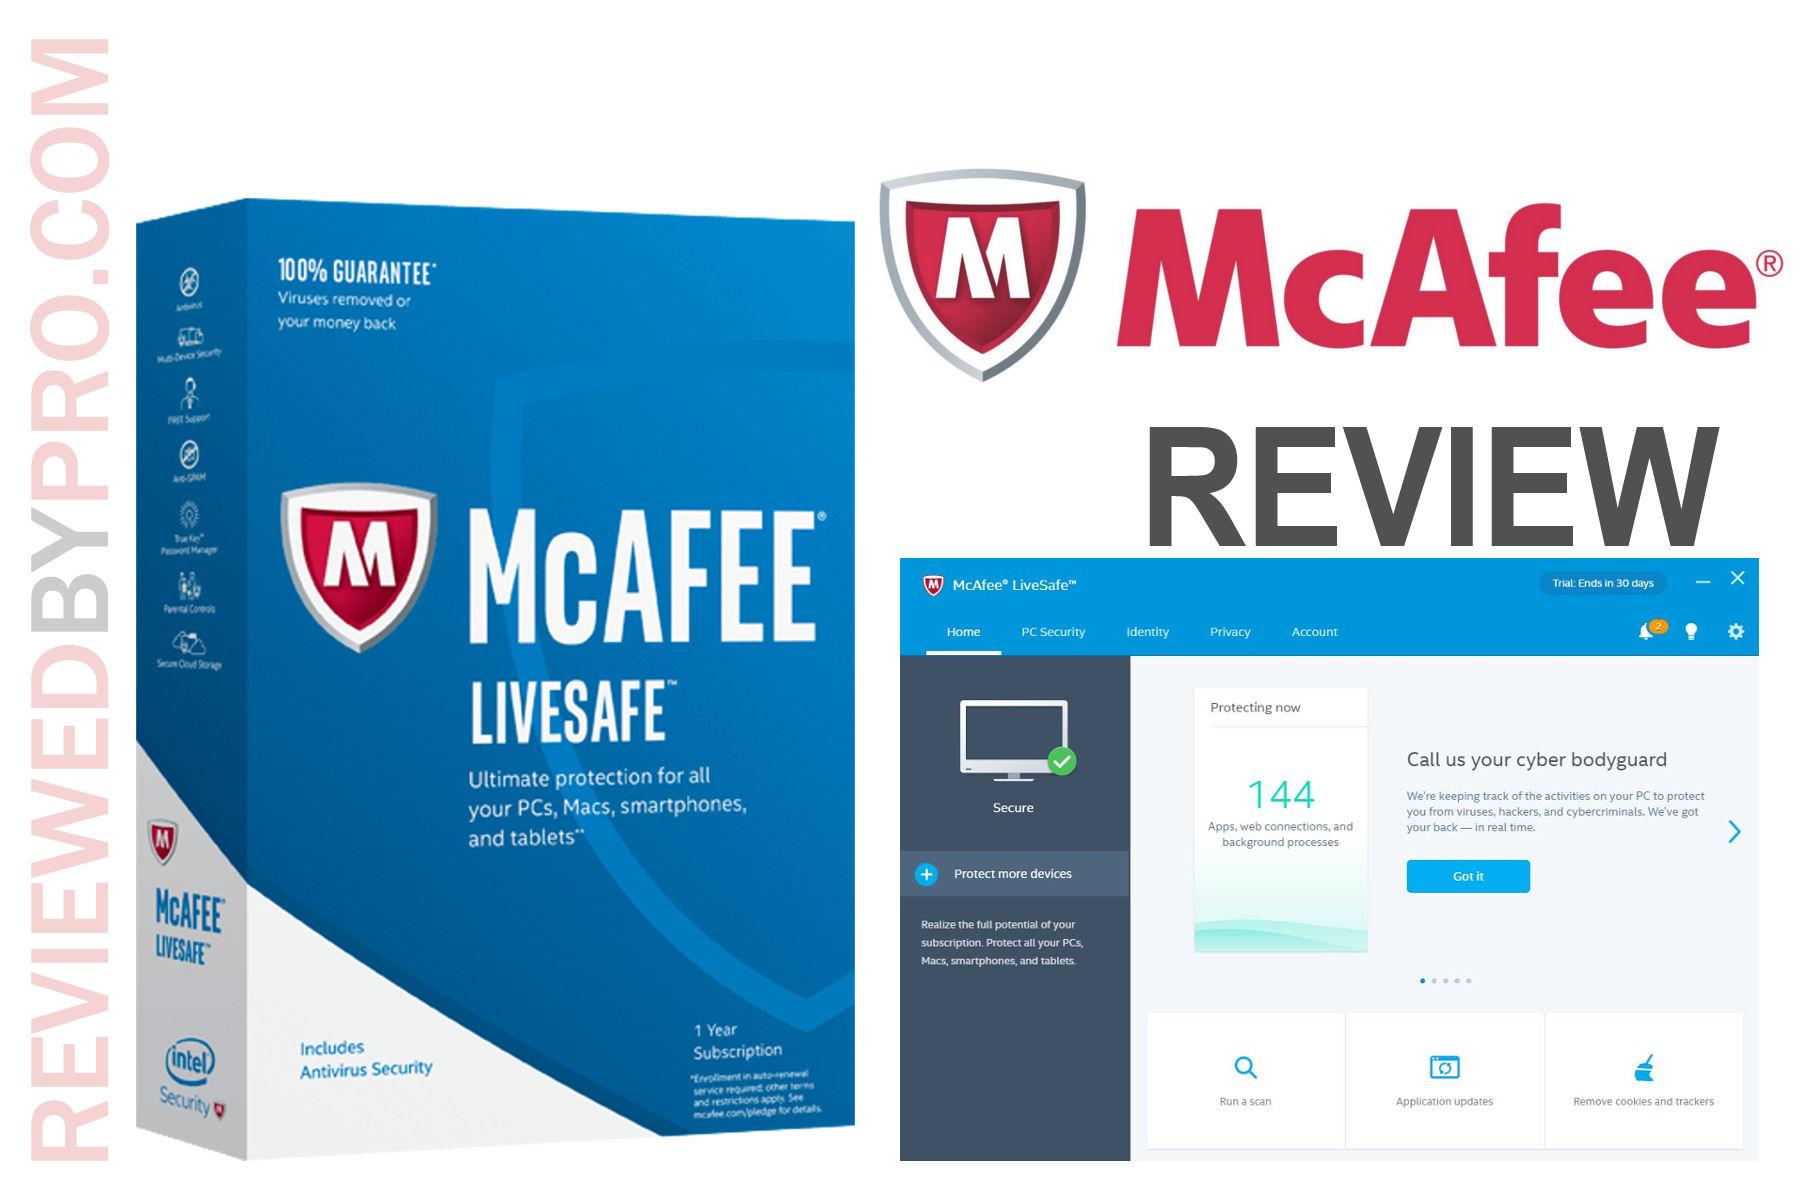 McAfee LiveSafe review